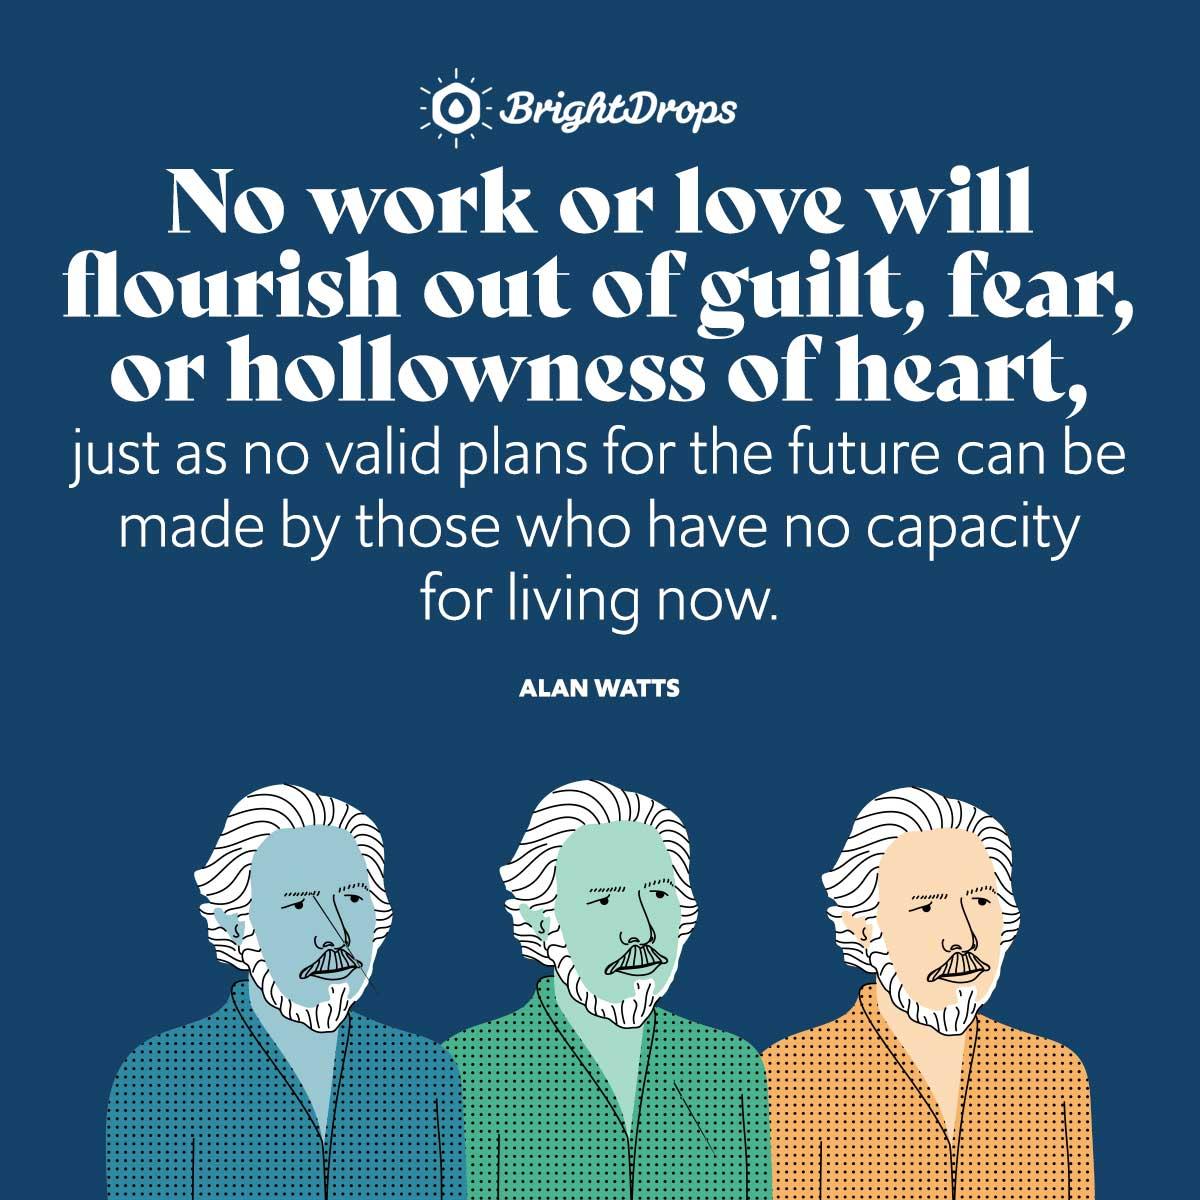 Alan Watts Quotes On Love